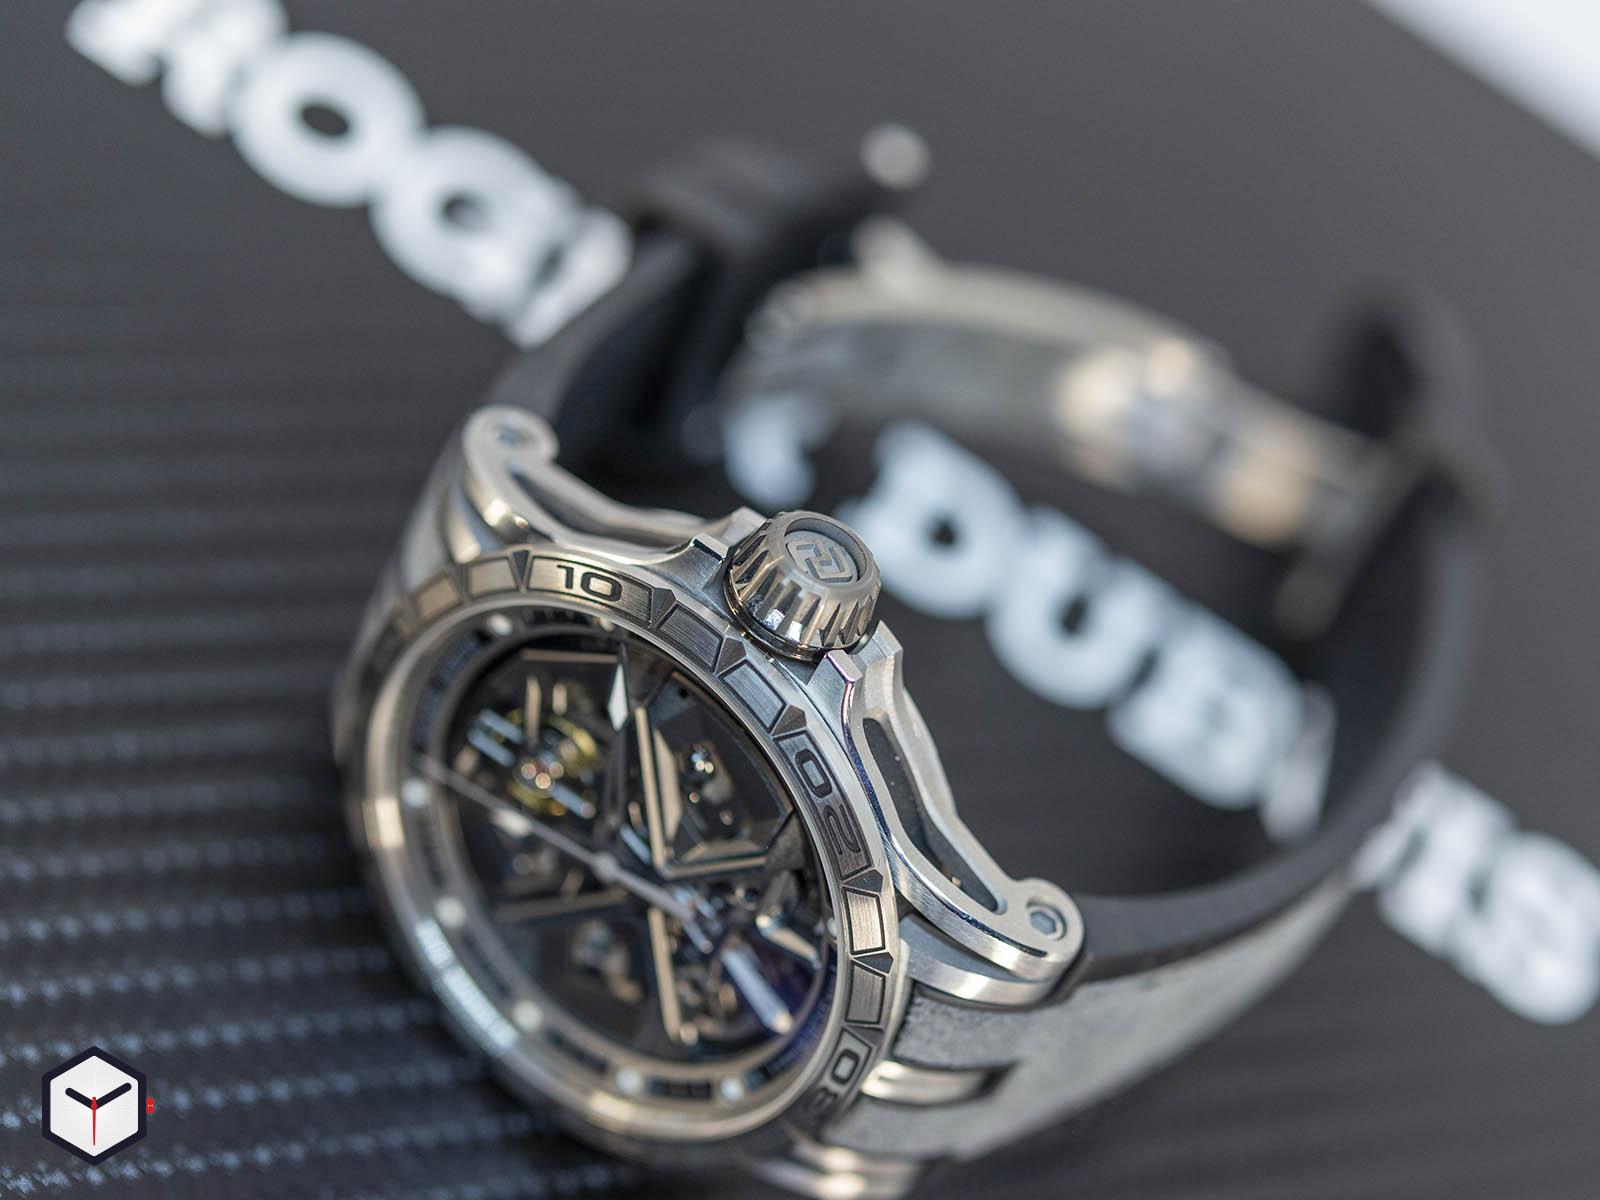 rddbex0748-roger-dubuis-excalibur-huracan-sihh-2019-4.jpg